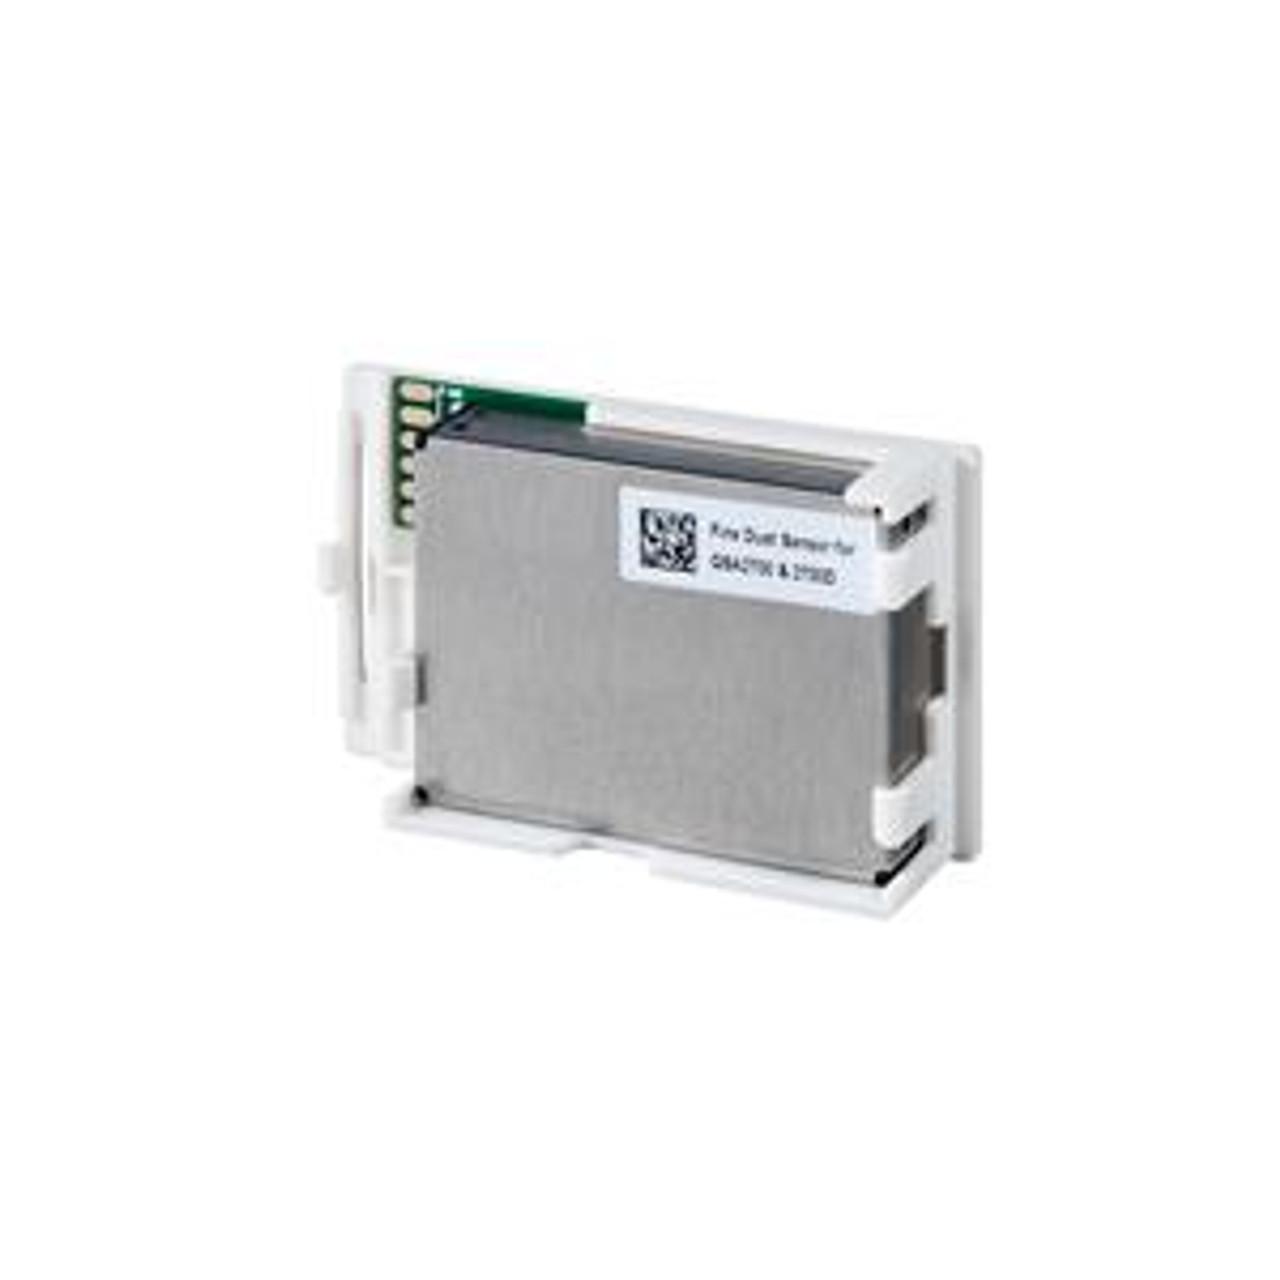 Siemens AQS2700 Sensor module for replacement S55720-S459